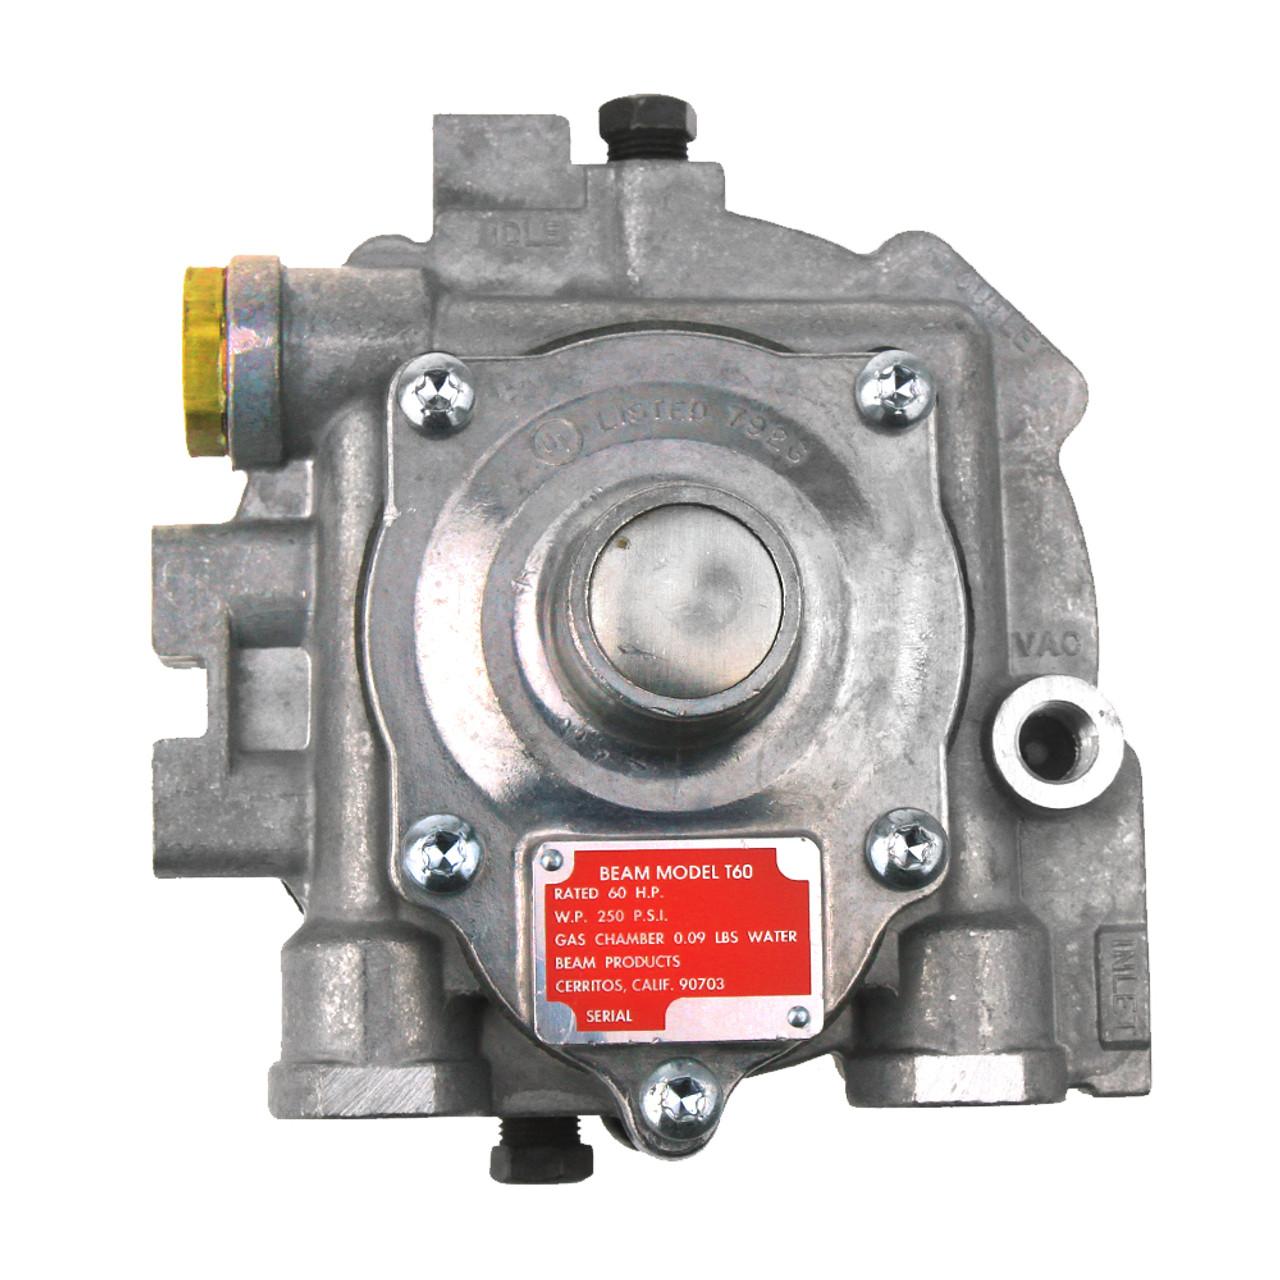 small resolution of impco beam model t60 60 hp gas chamber propane forklift gas regulator